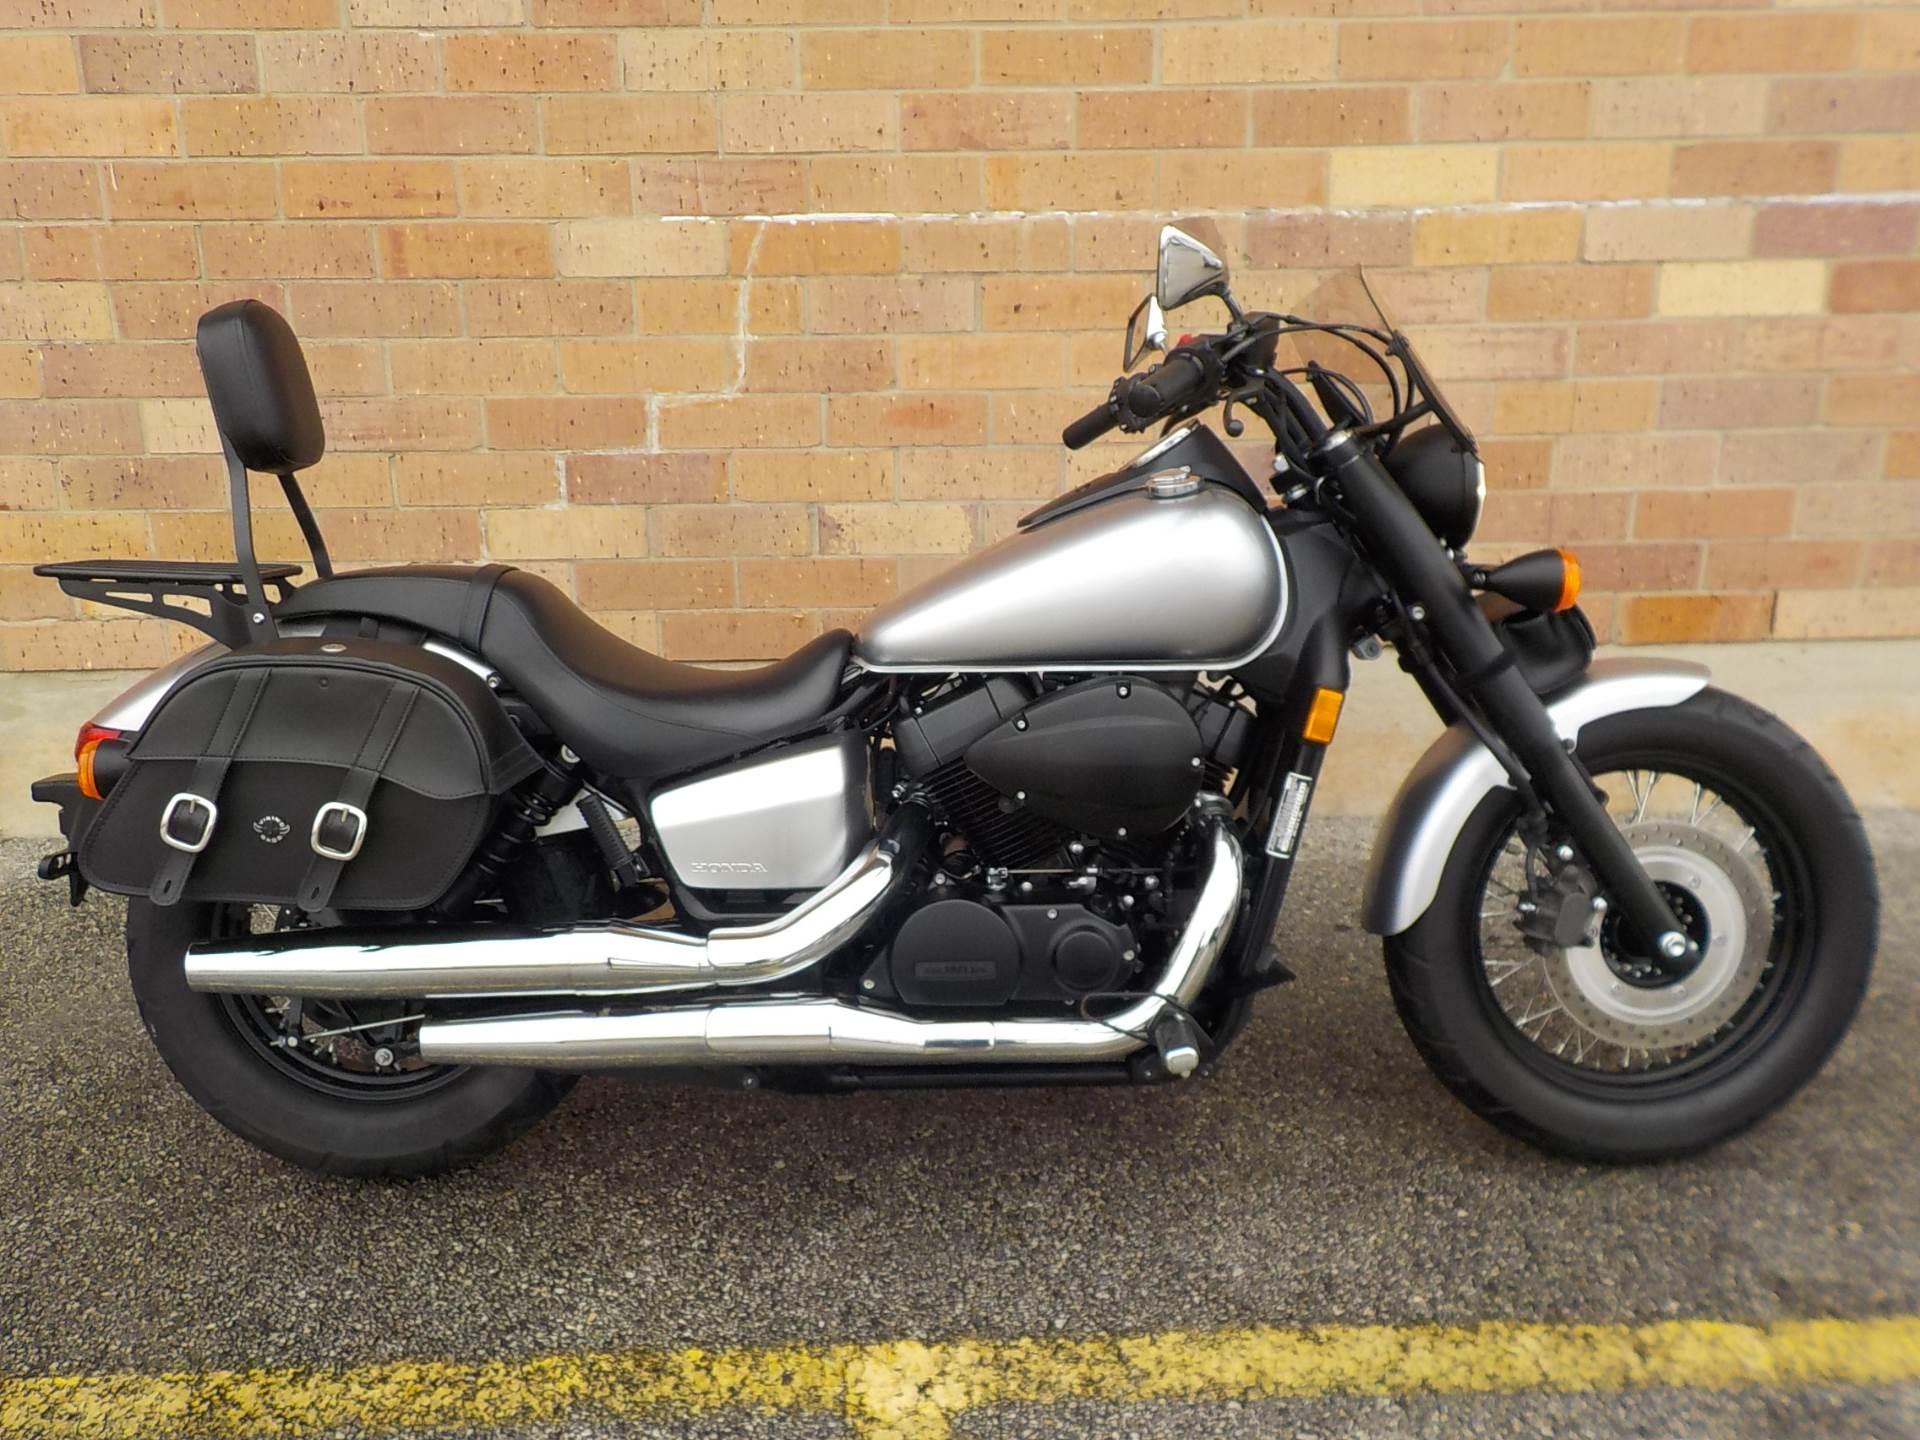 Used 2015 Honda Shadow Phantom® Motorcycles in San Antonio, TX ...